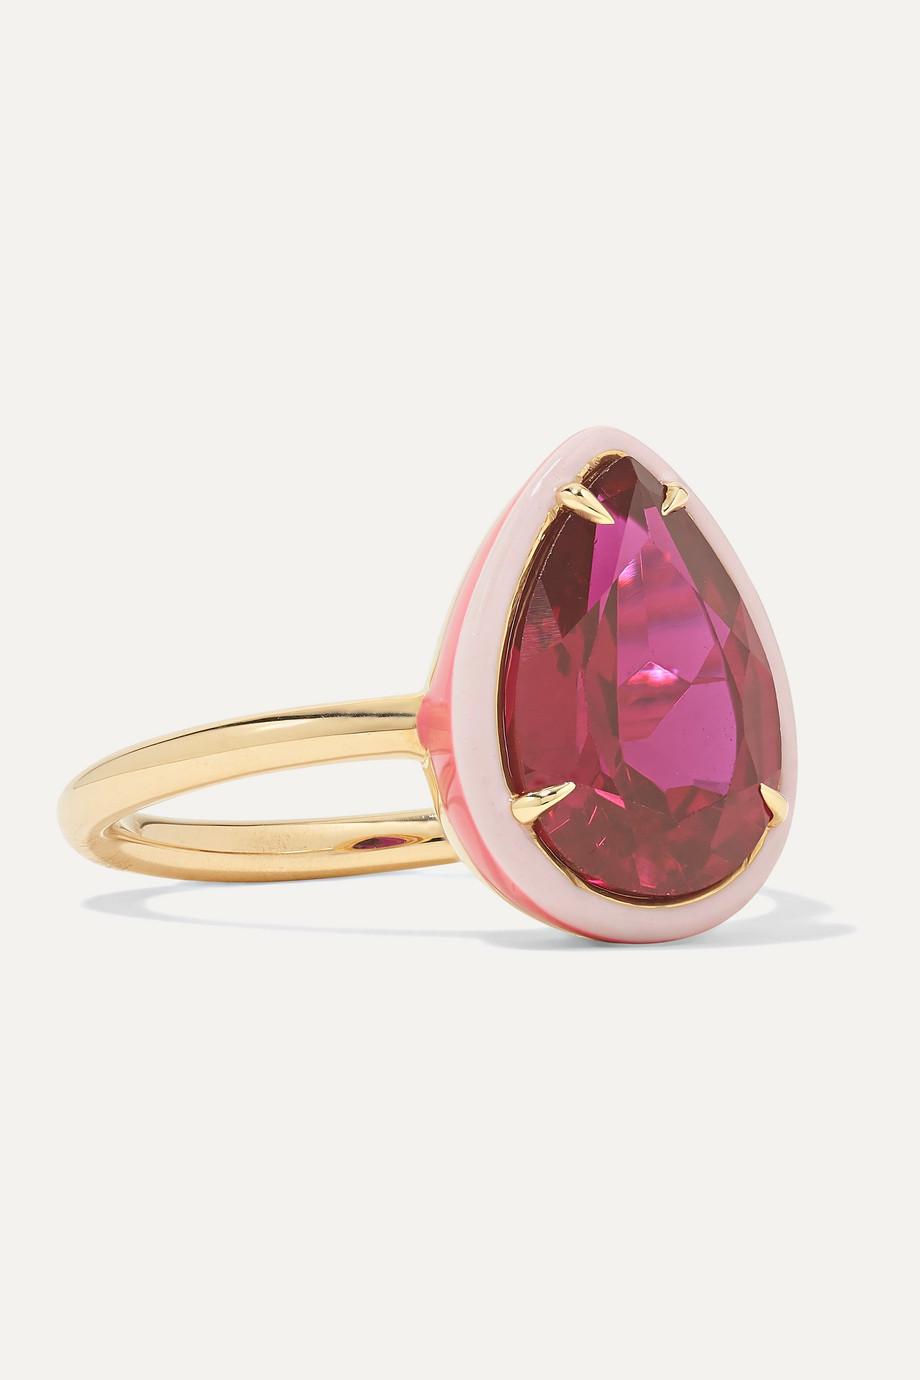 Alison Lou Cocktail 14K 黄金、搪瓷、红宝石戒指